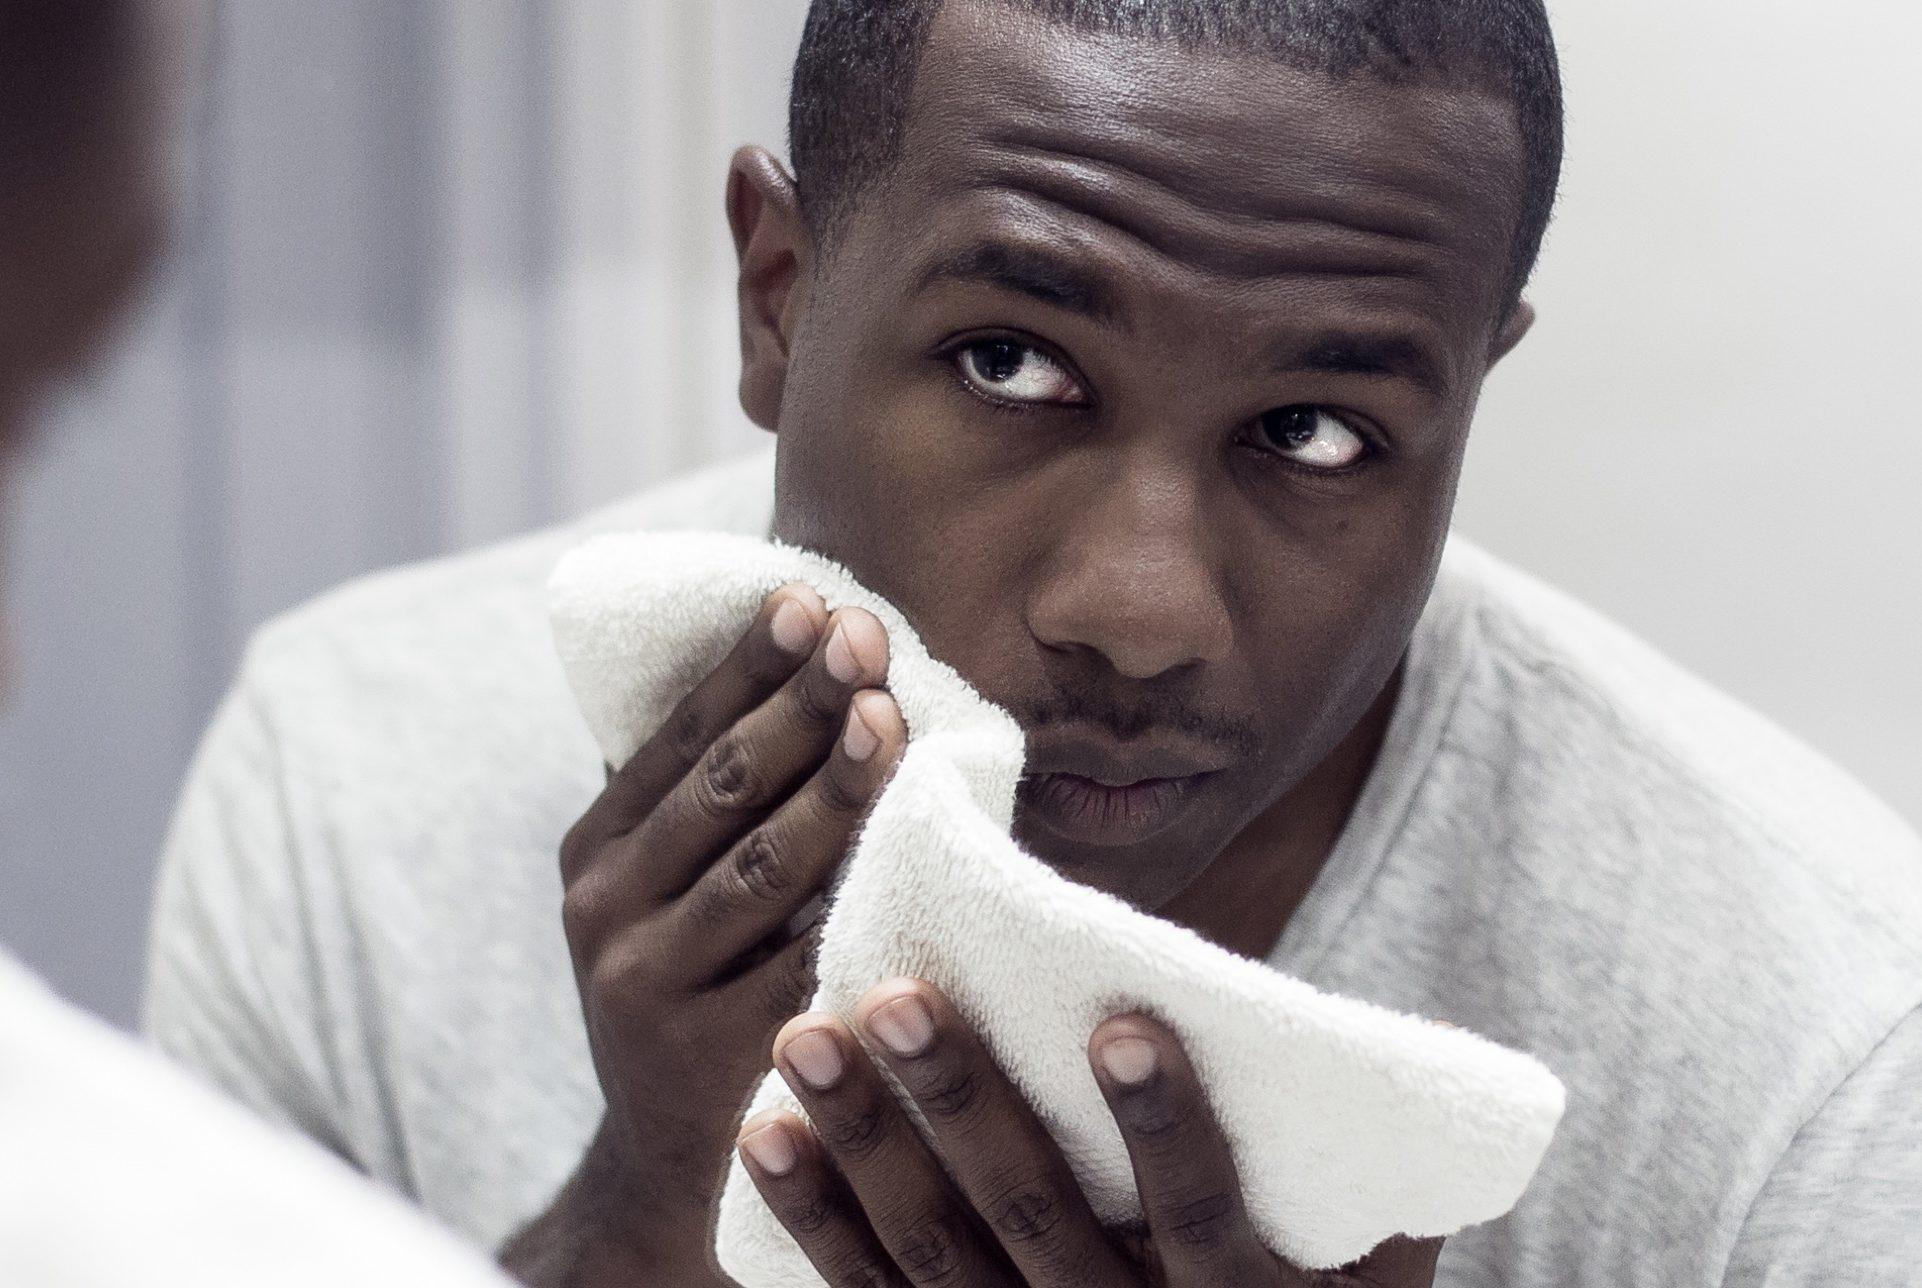 bevel face wash skin care